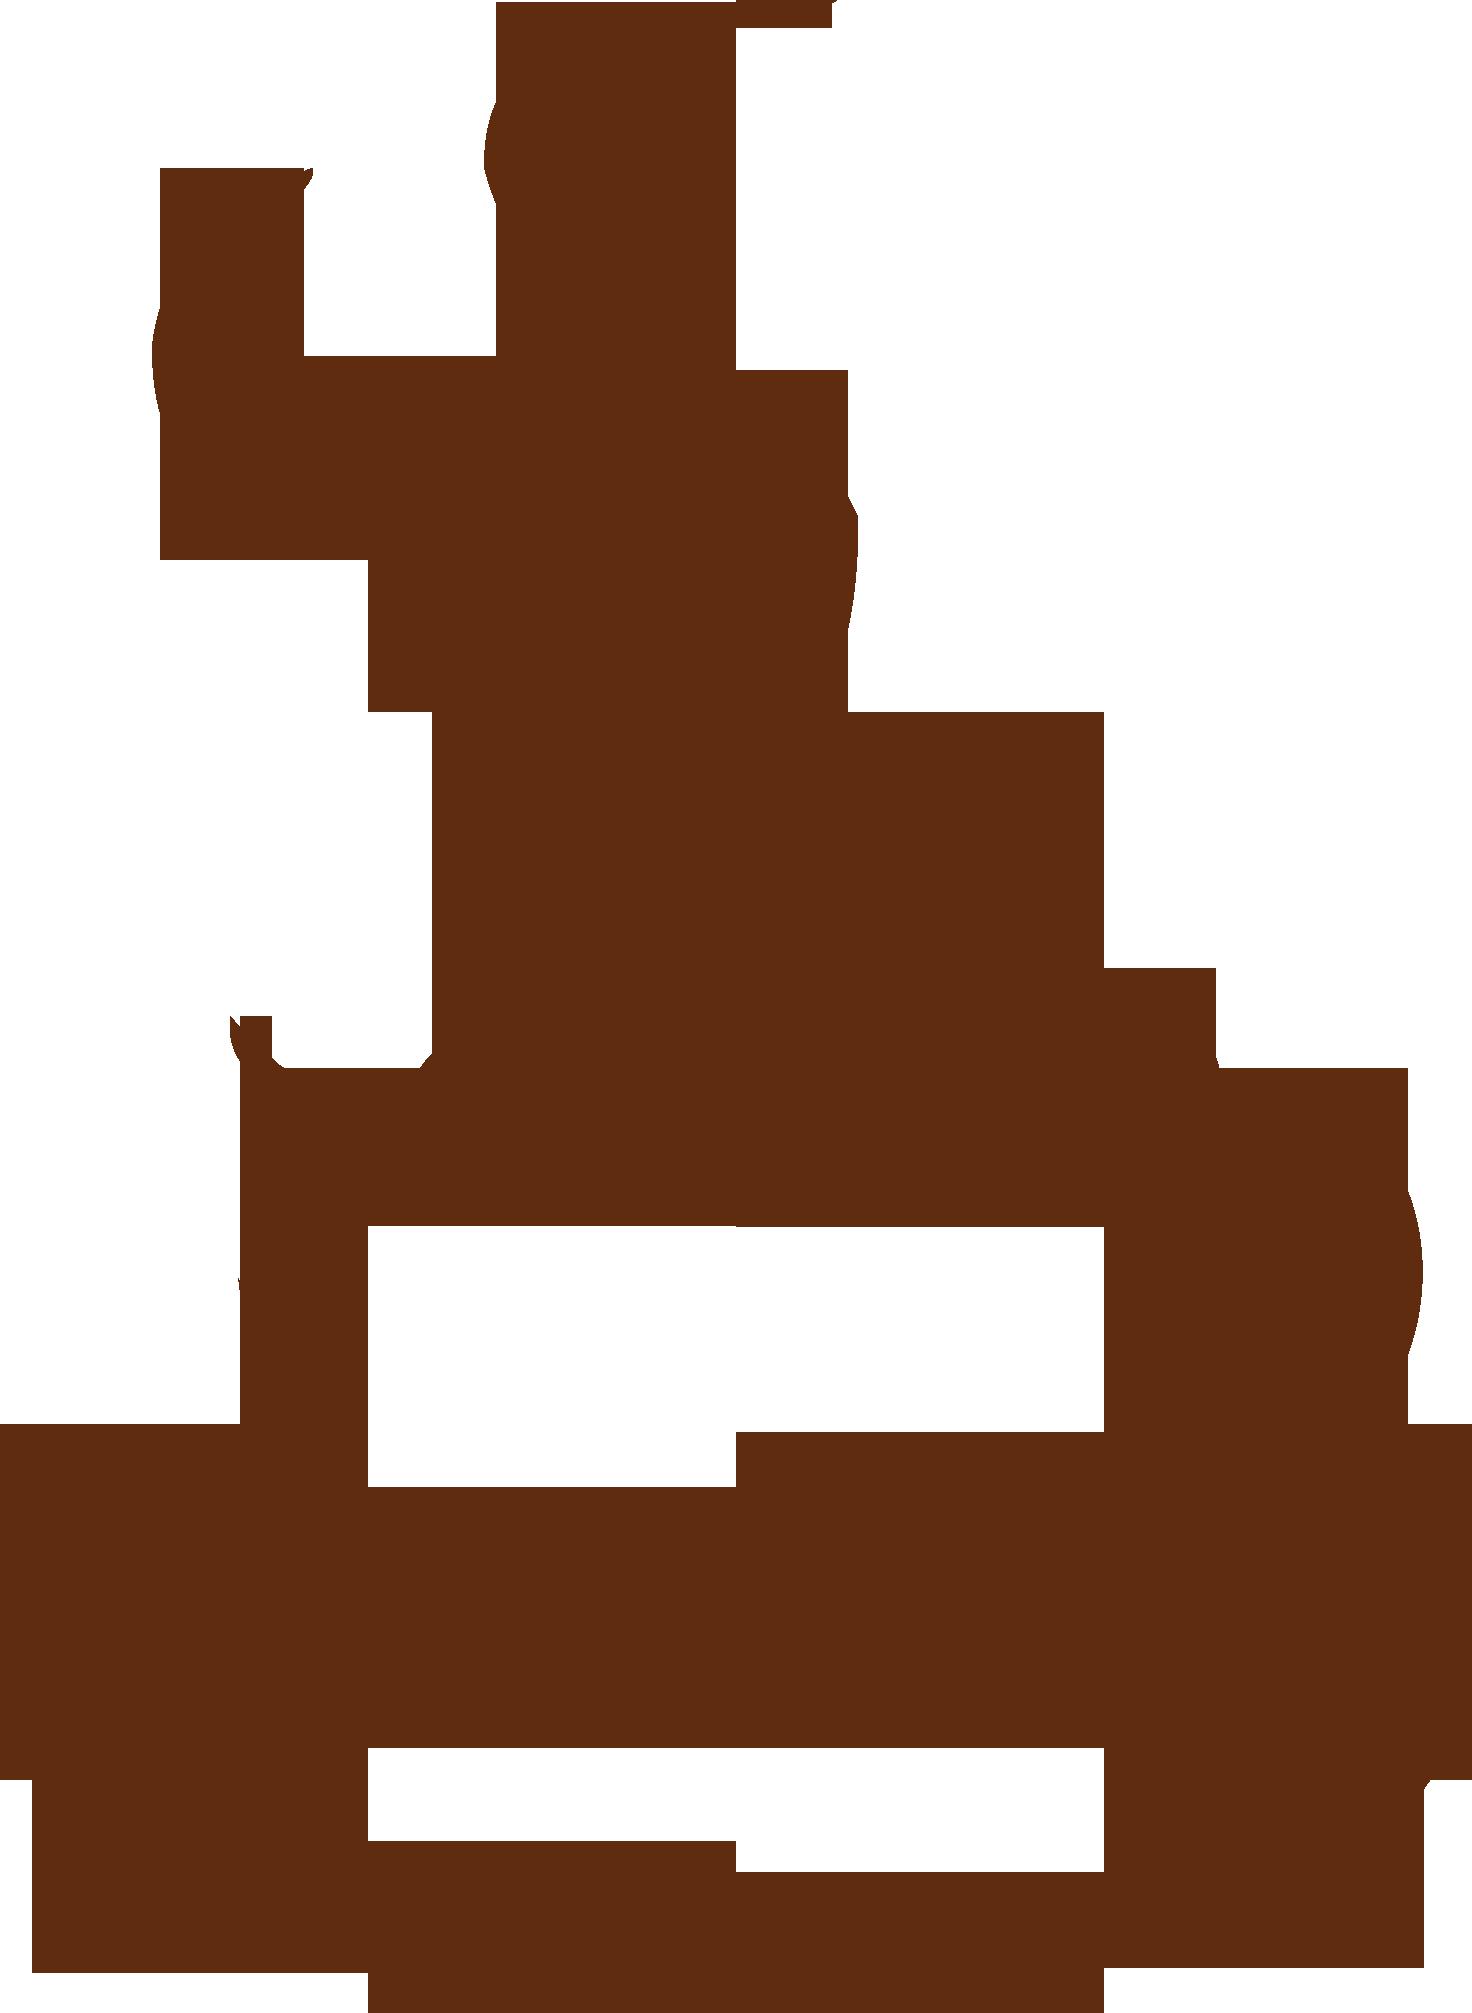 Clipart Coffee Animasi Clipart Coffee Animasi Transparent